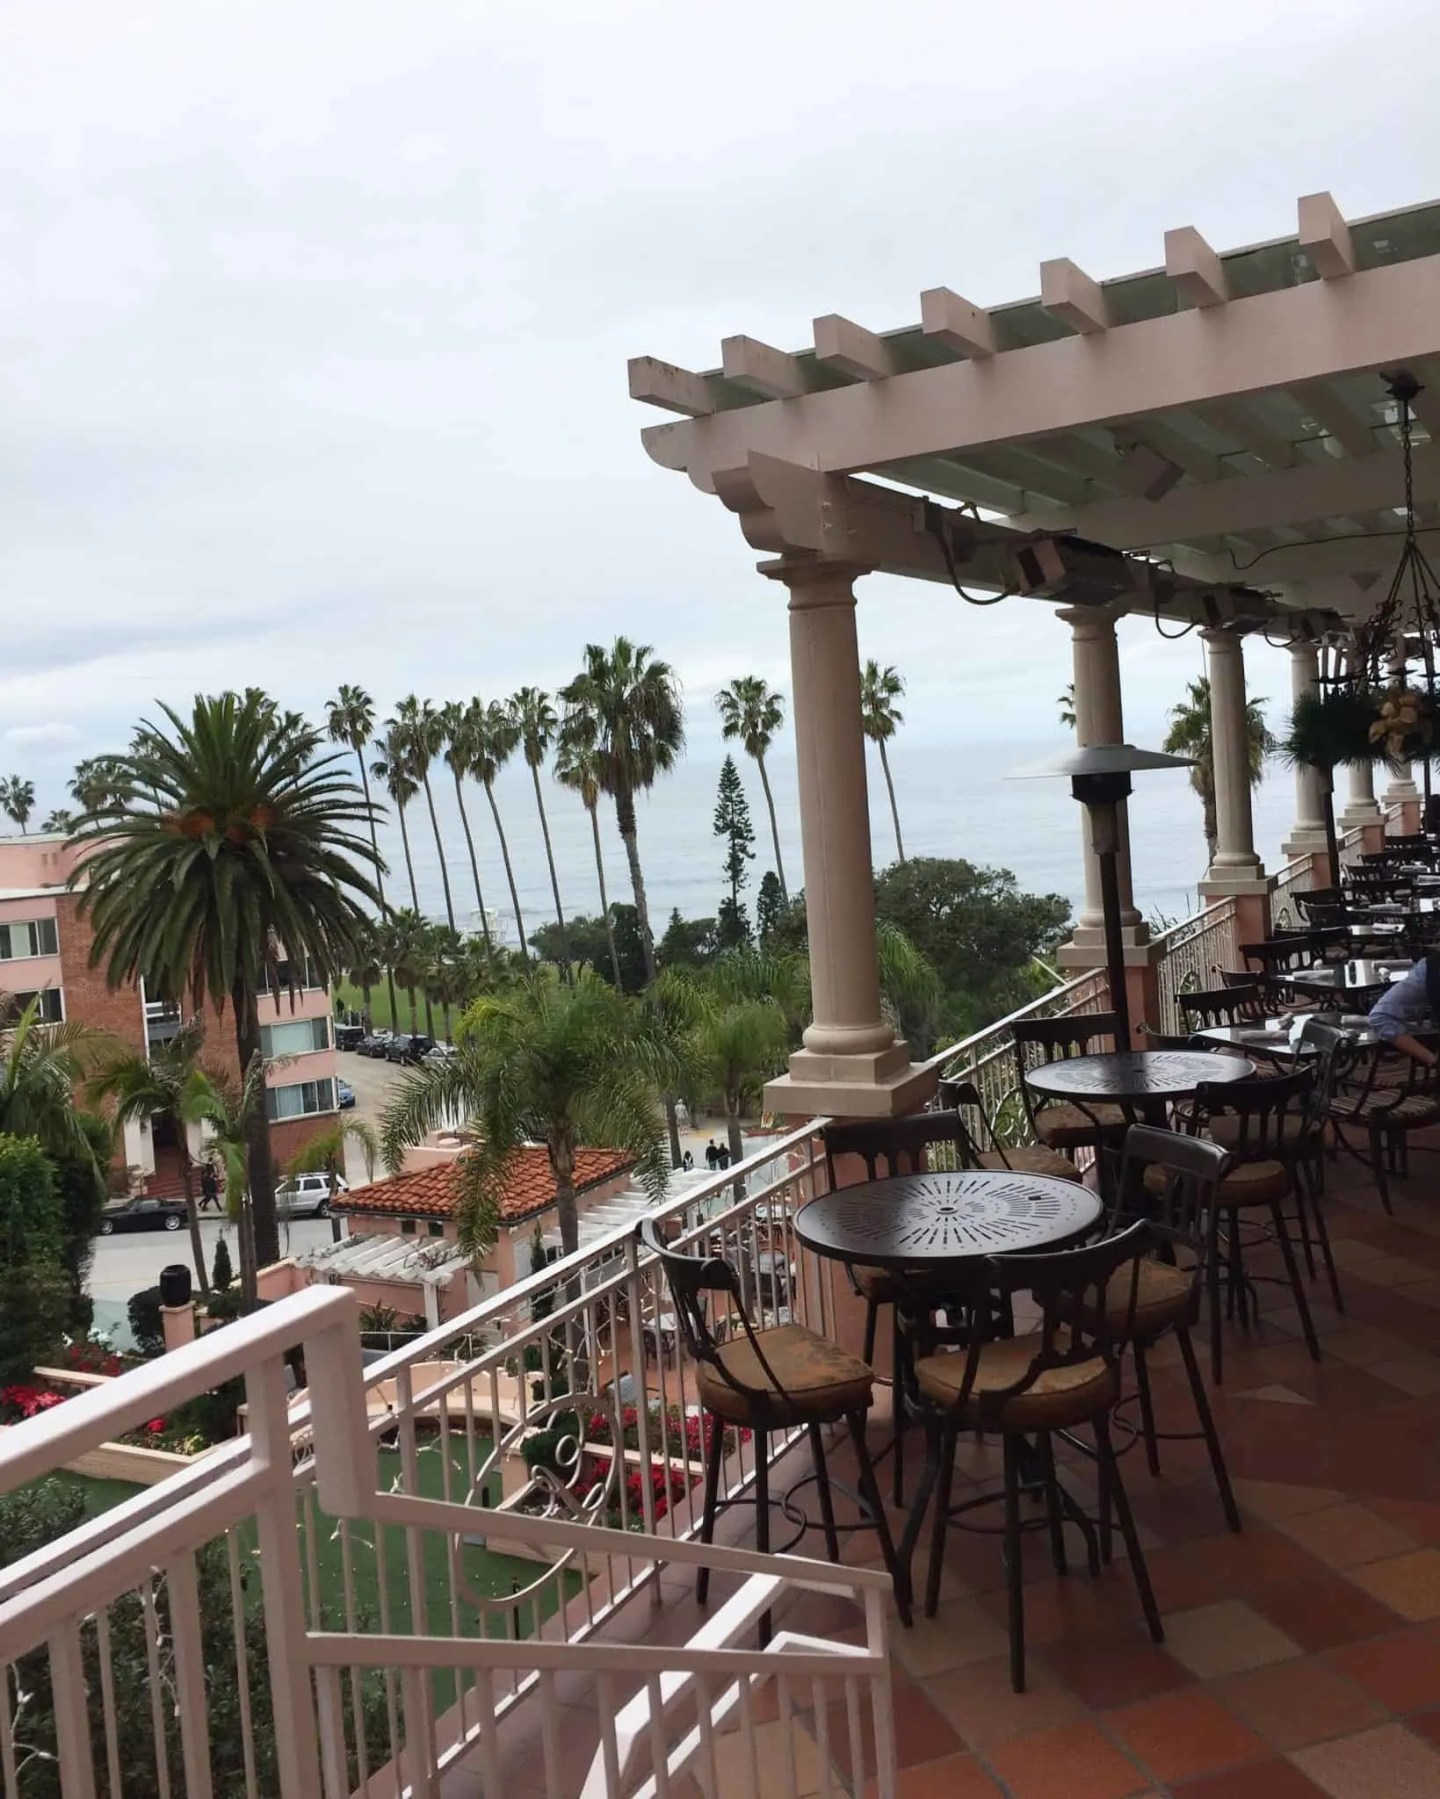 A Day Trip to La Jolla, California – A Must Travel Destination